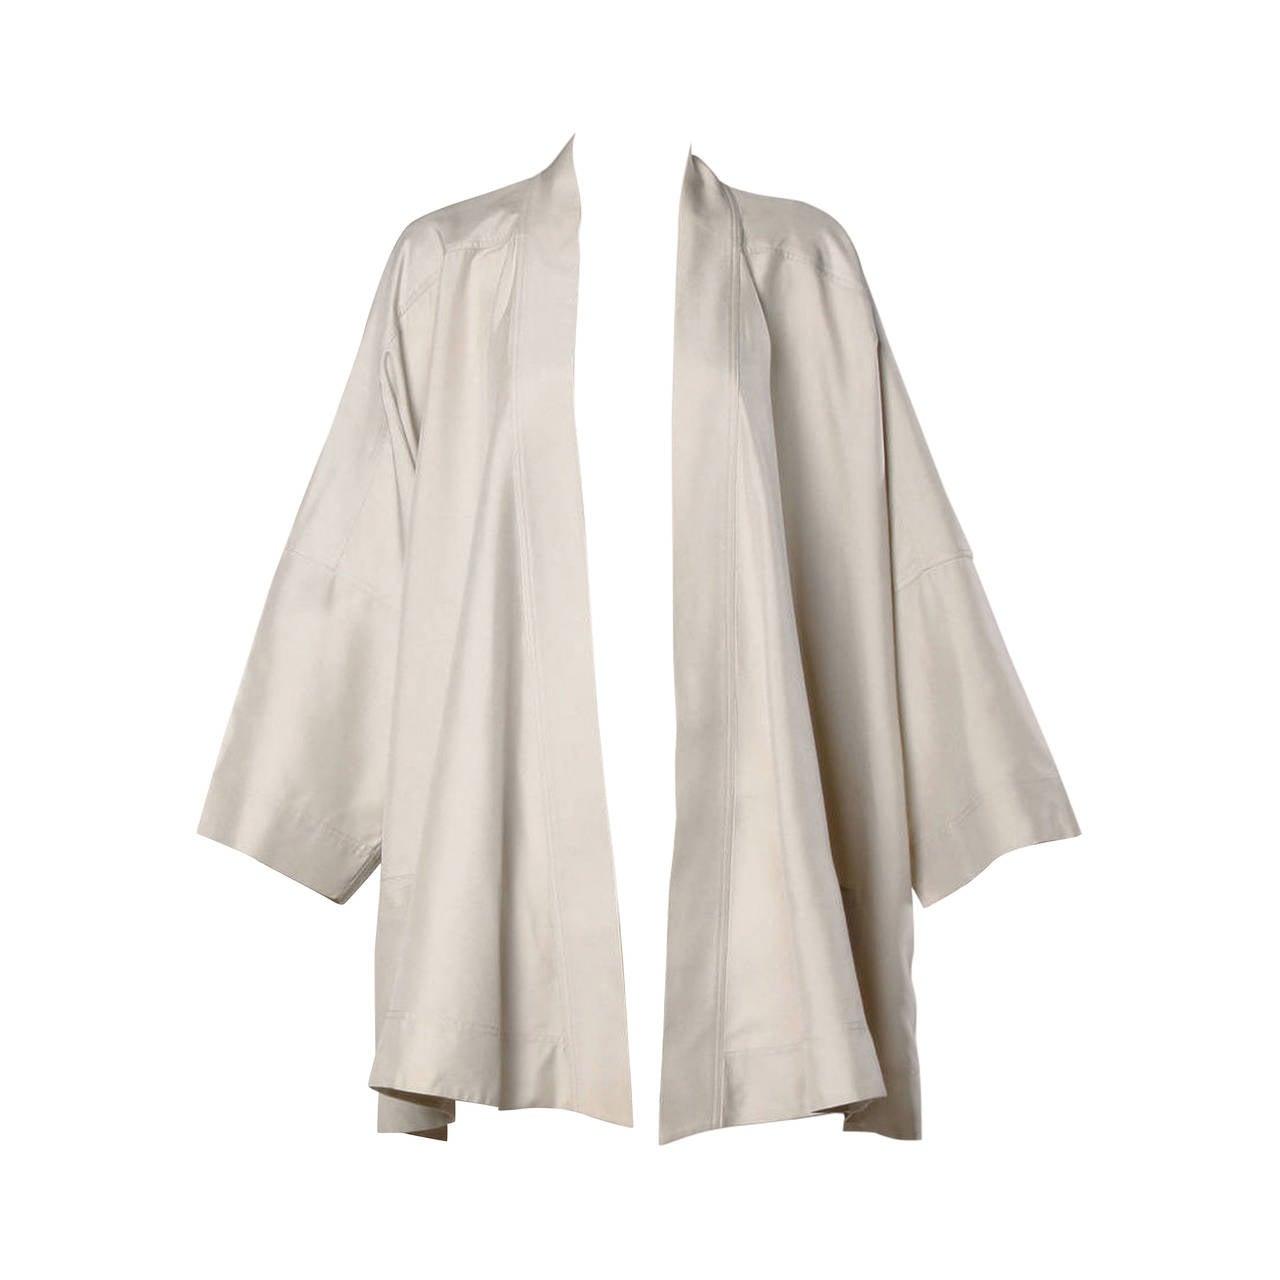 Stunning Salvatore Ferragamo Vintage Silk Kimono Jacket or Swing ...